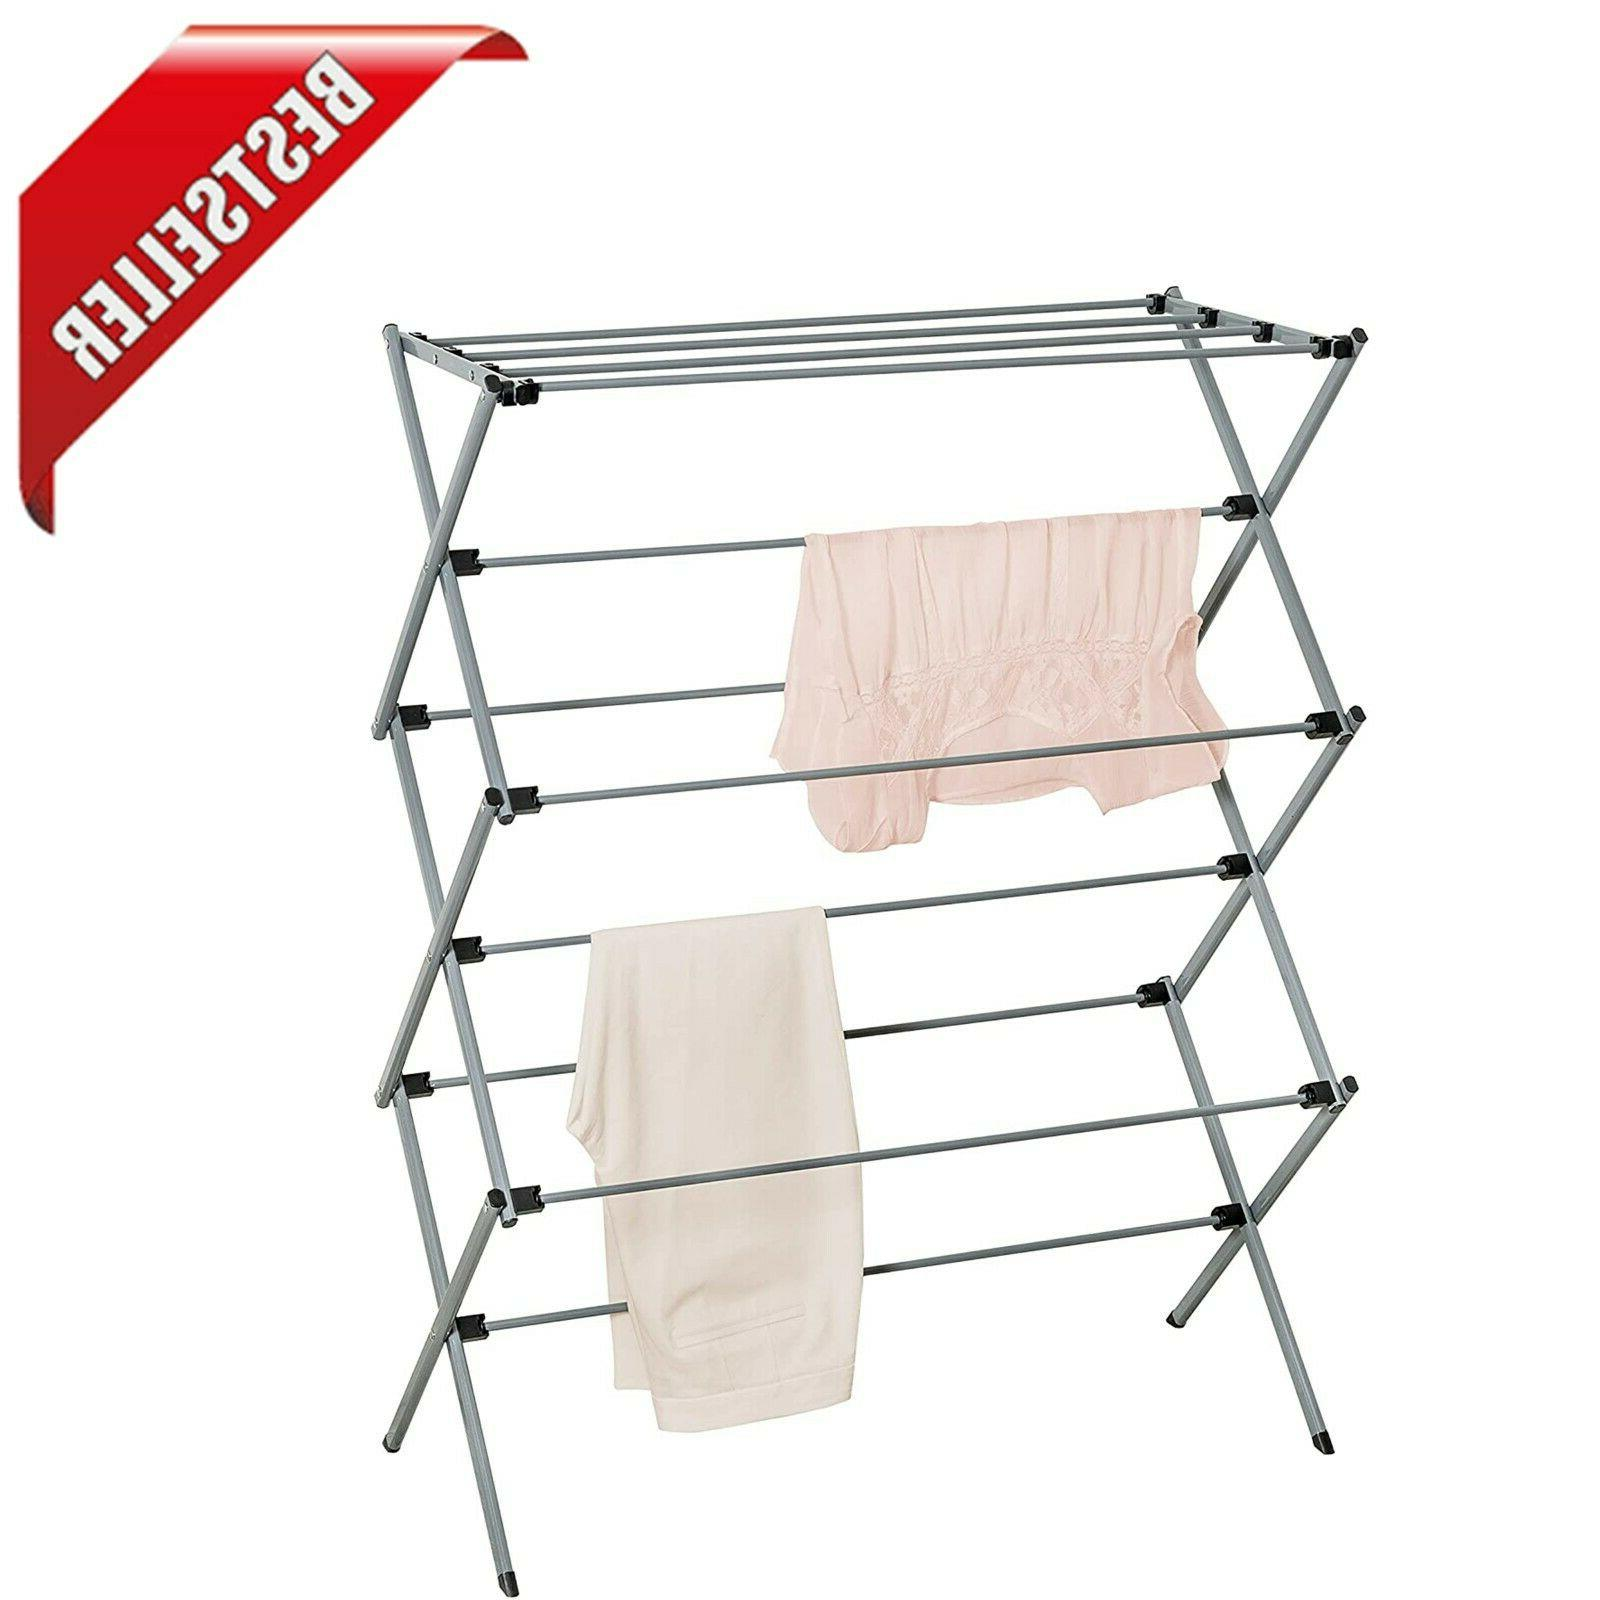 dry 02119 folding rack